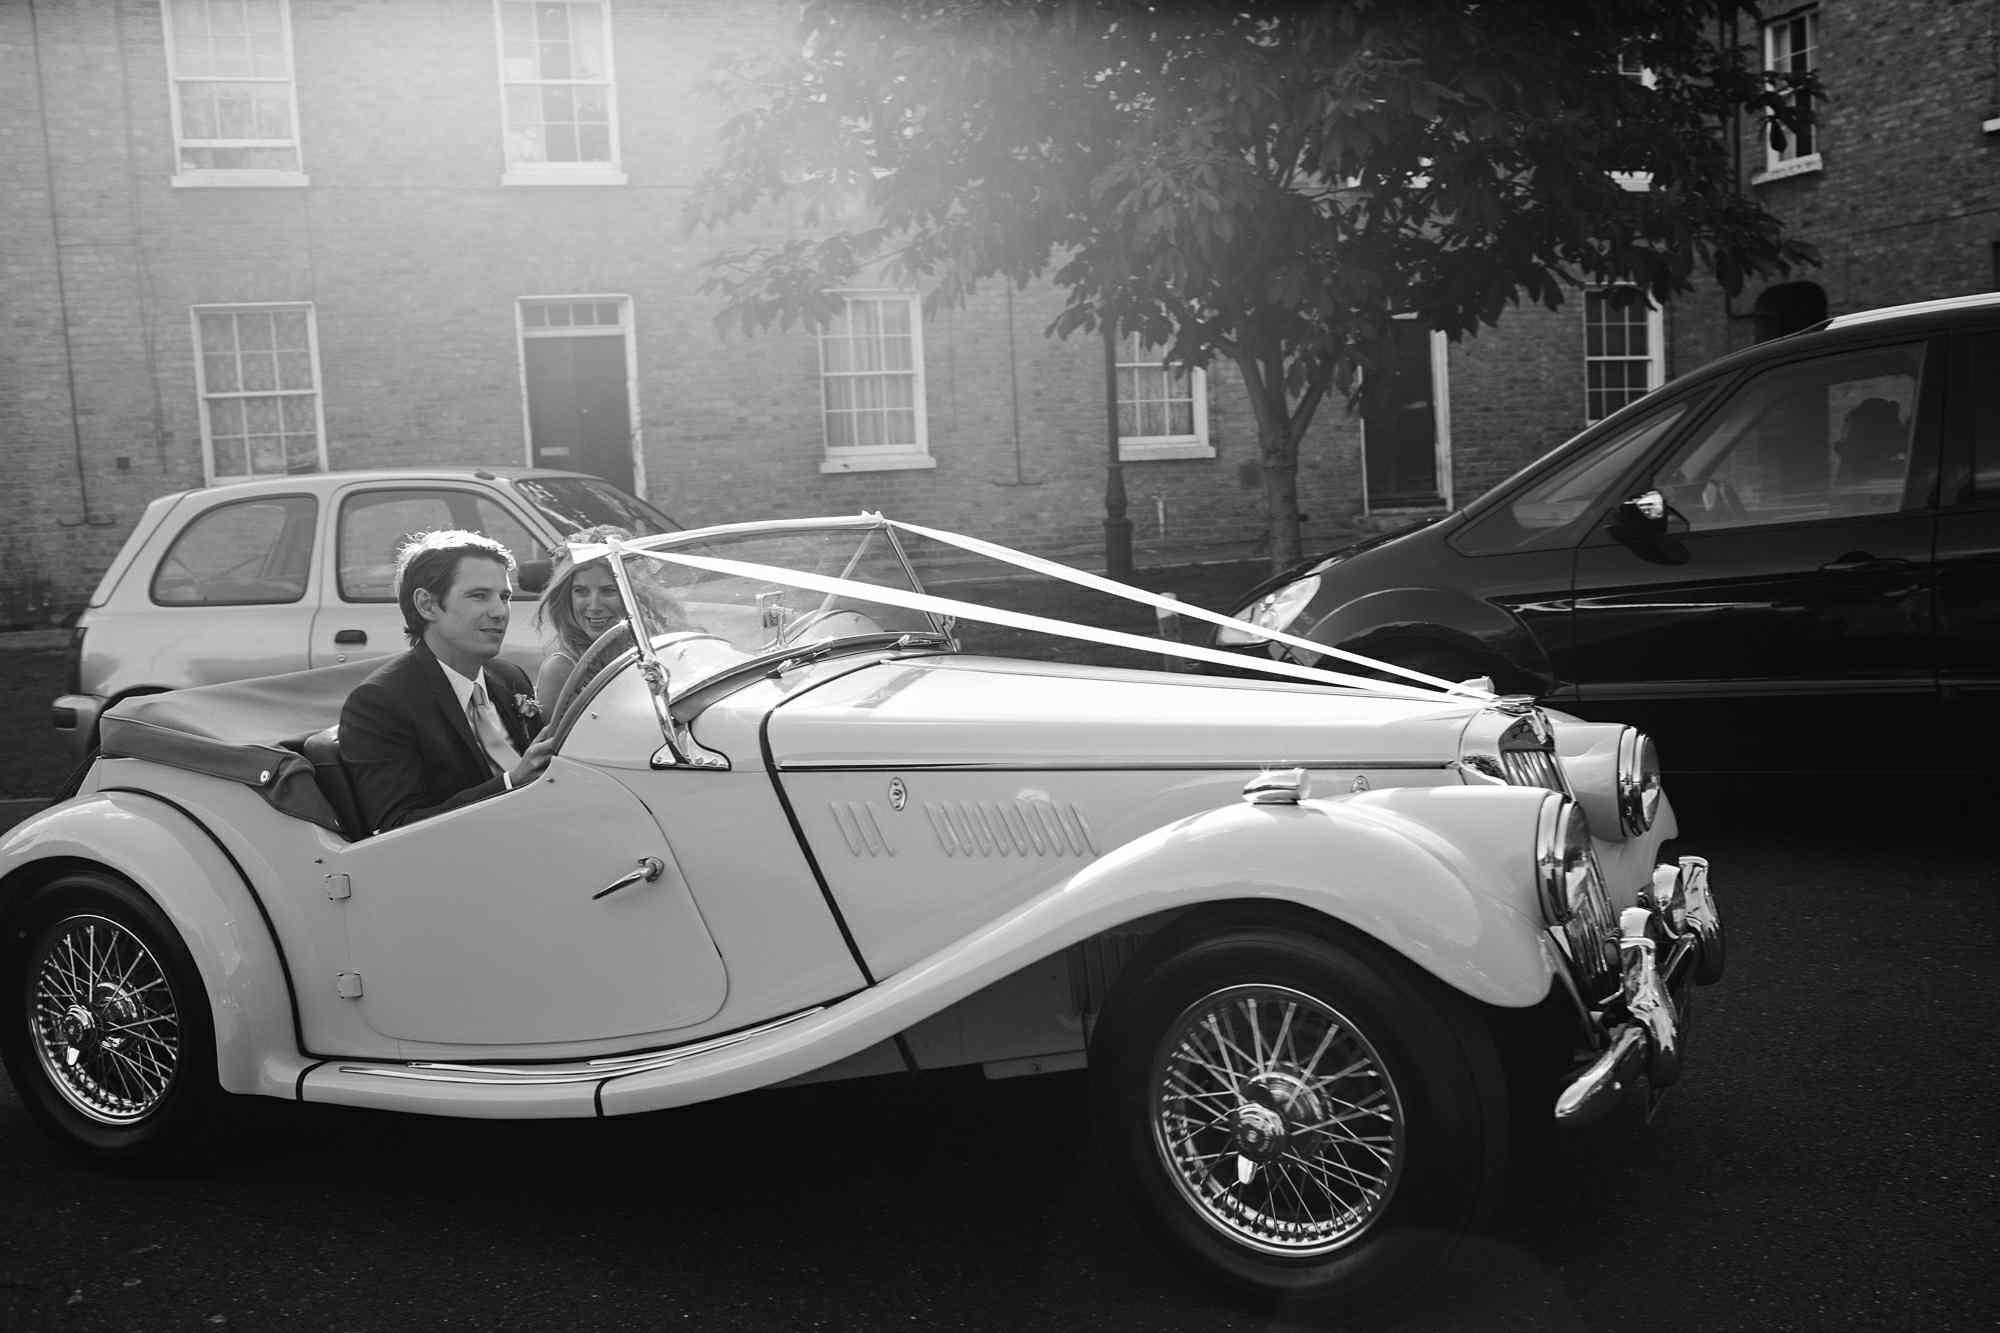 Newlyweds leaving in car